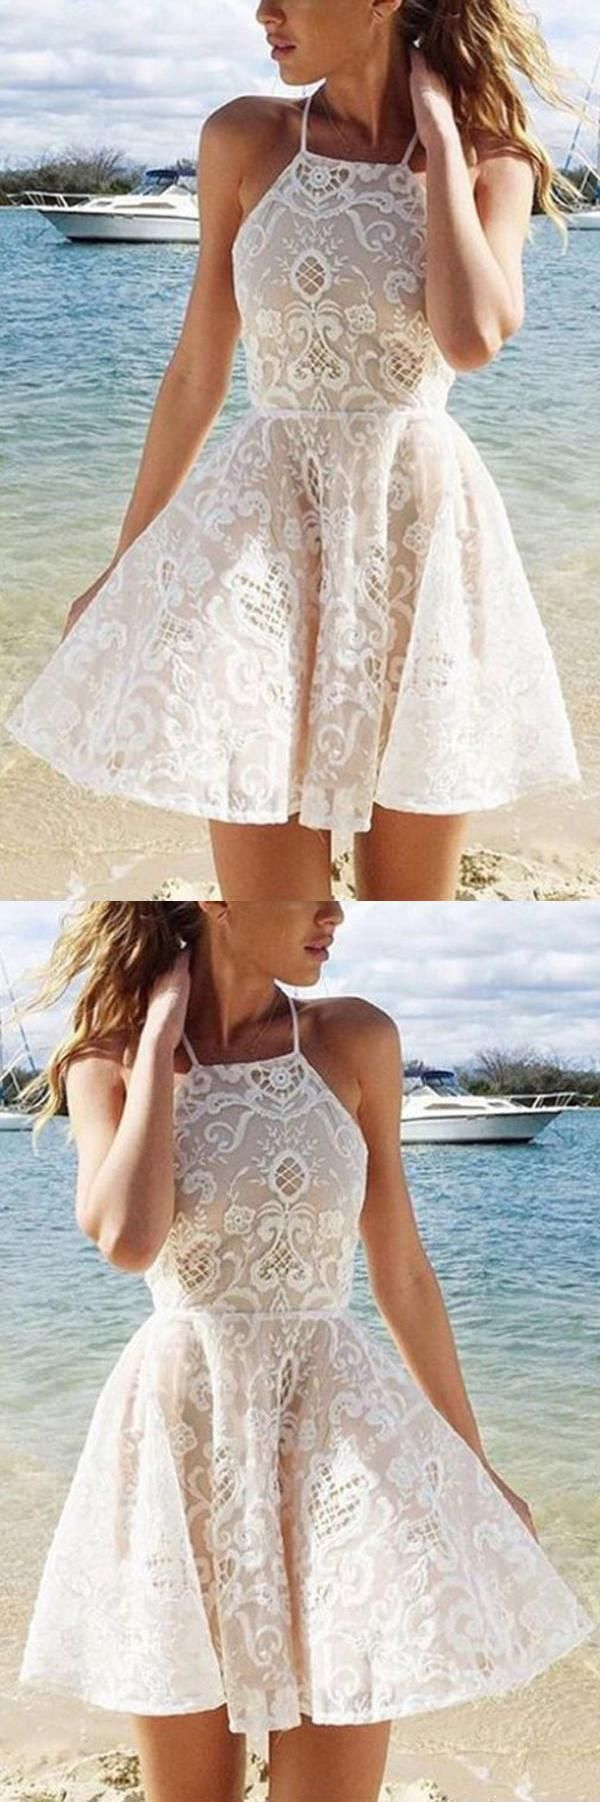 Cute prom dress cutepromdress lace homecoming dress